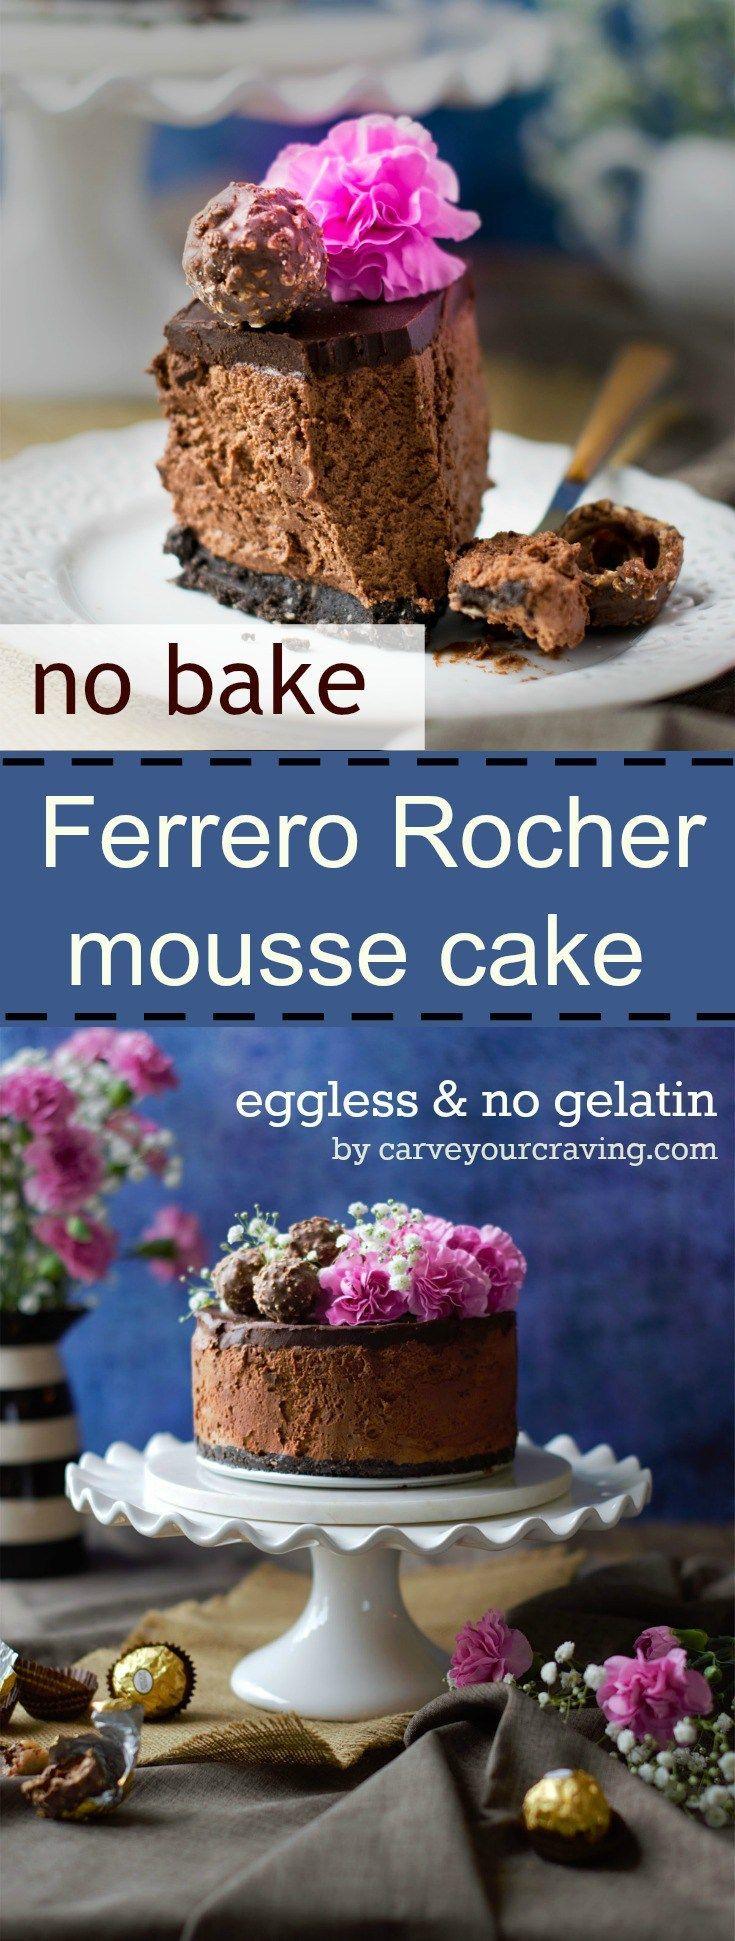 No bake eggless ferrero rocher mousse cake (scheduled via http://www.tailwindapp.com?utm_source=pinterest&utm_medium=twpin&utm_content=post94961671&utm_campaign=scheduler_attribution)